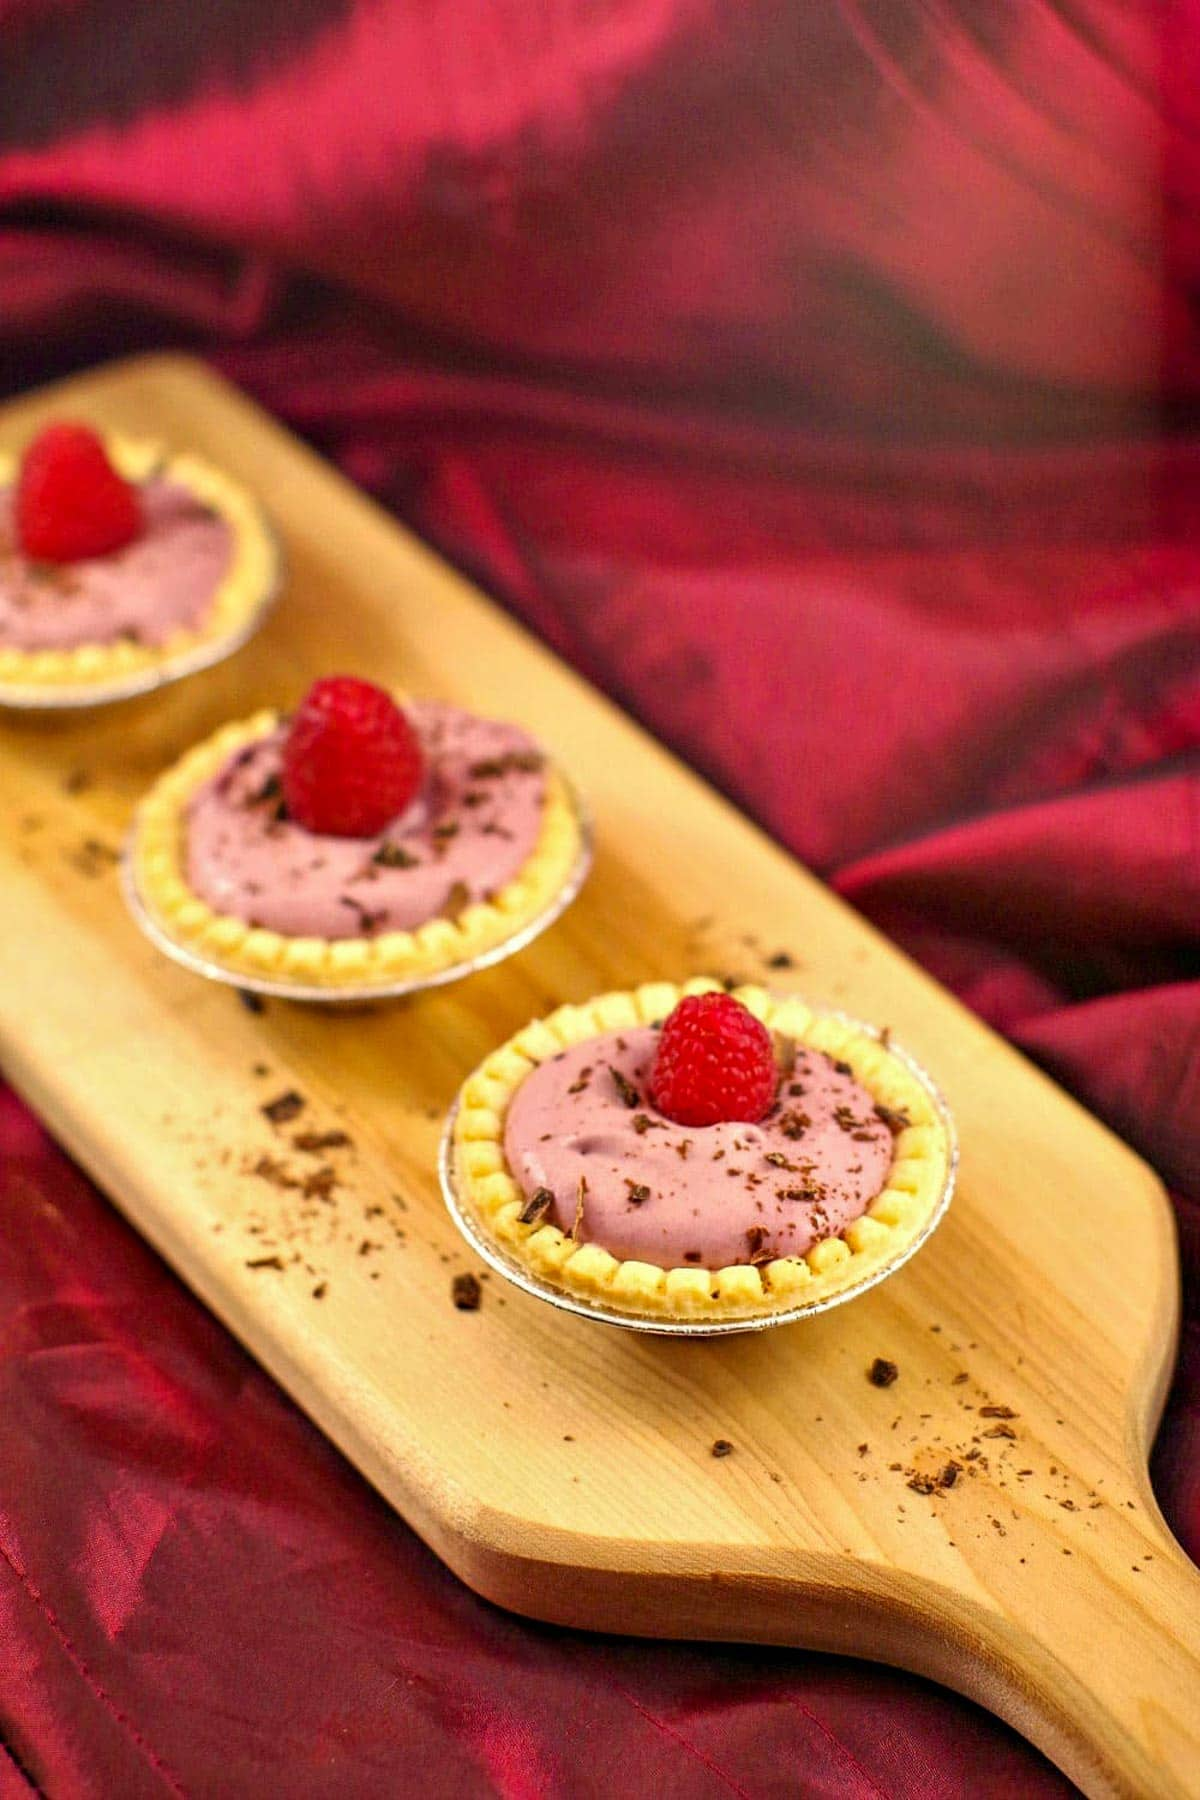 3 raspberry tiramisu tarts on a narrow wooden cutting board